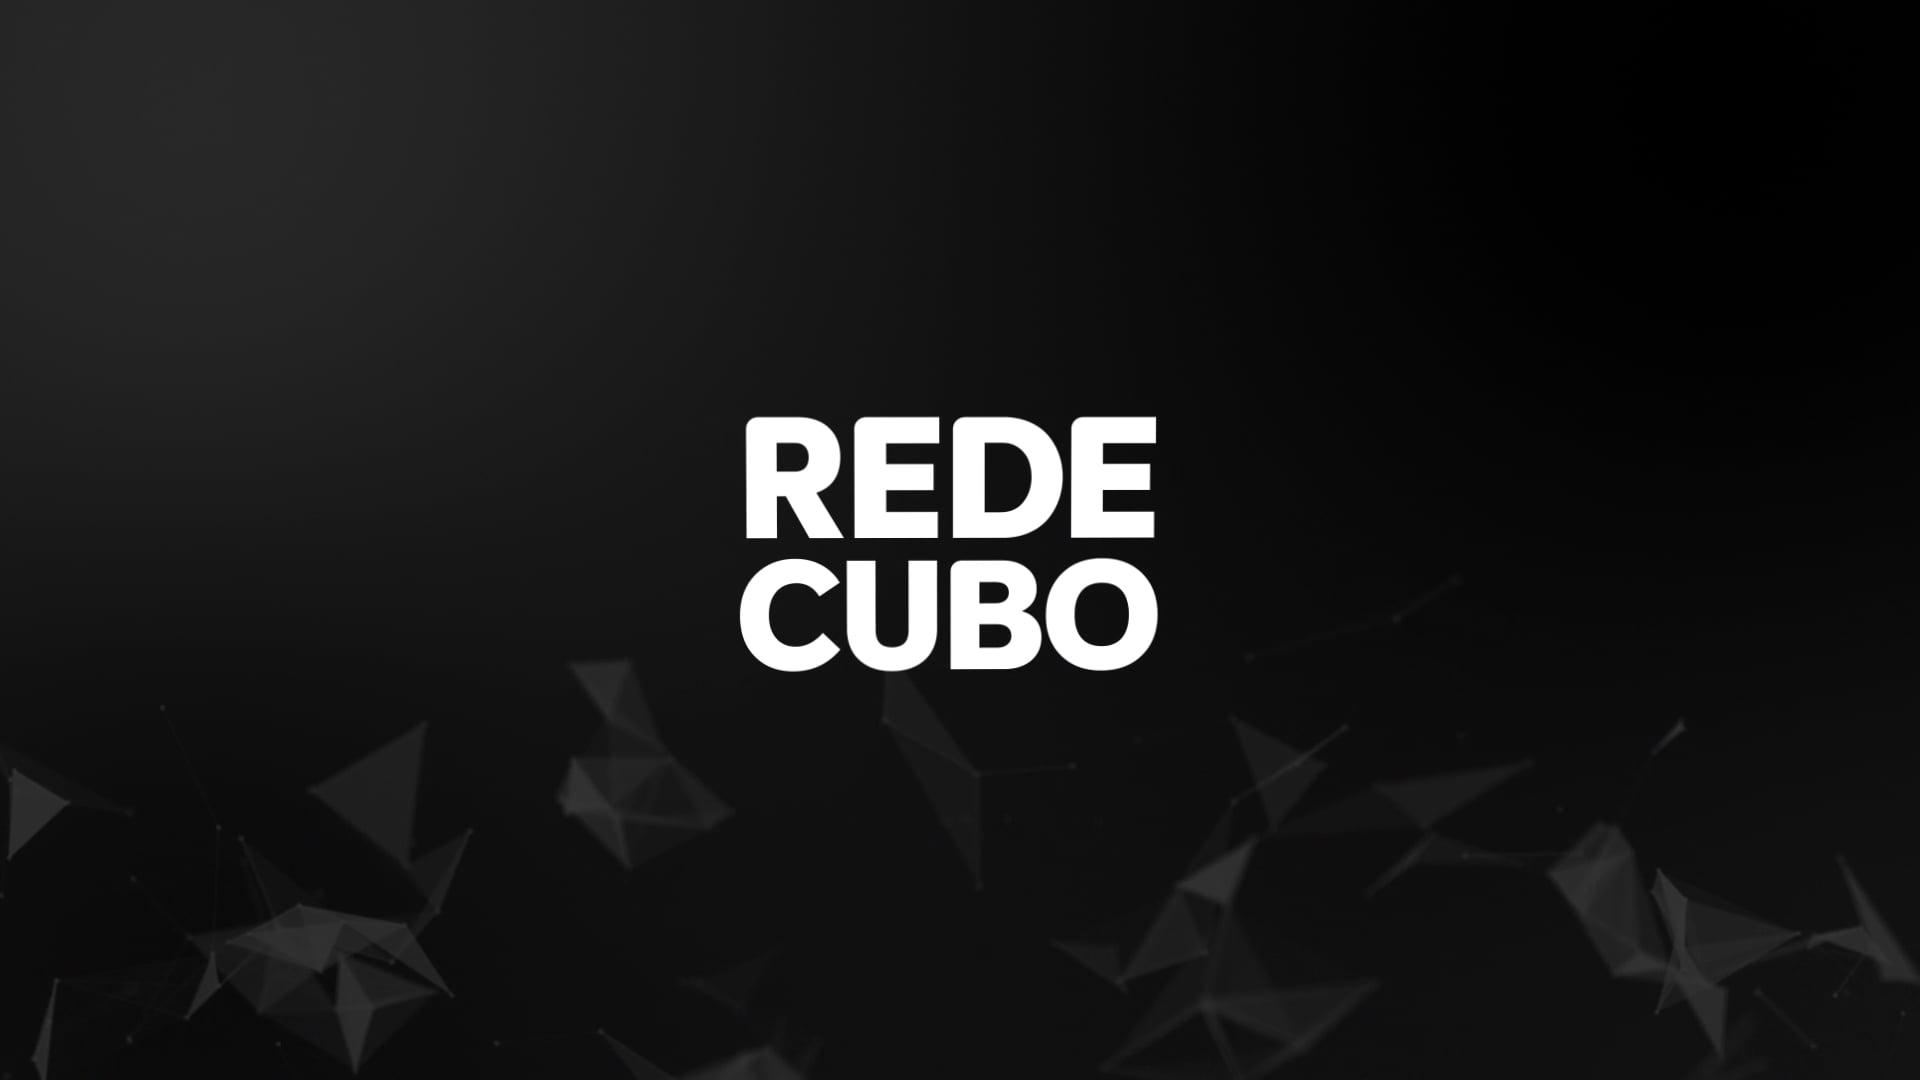 VINHETA REDE CUBO 2019